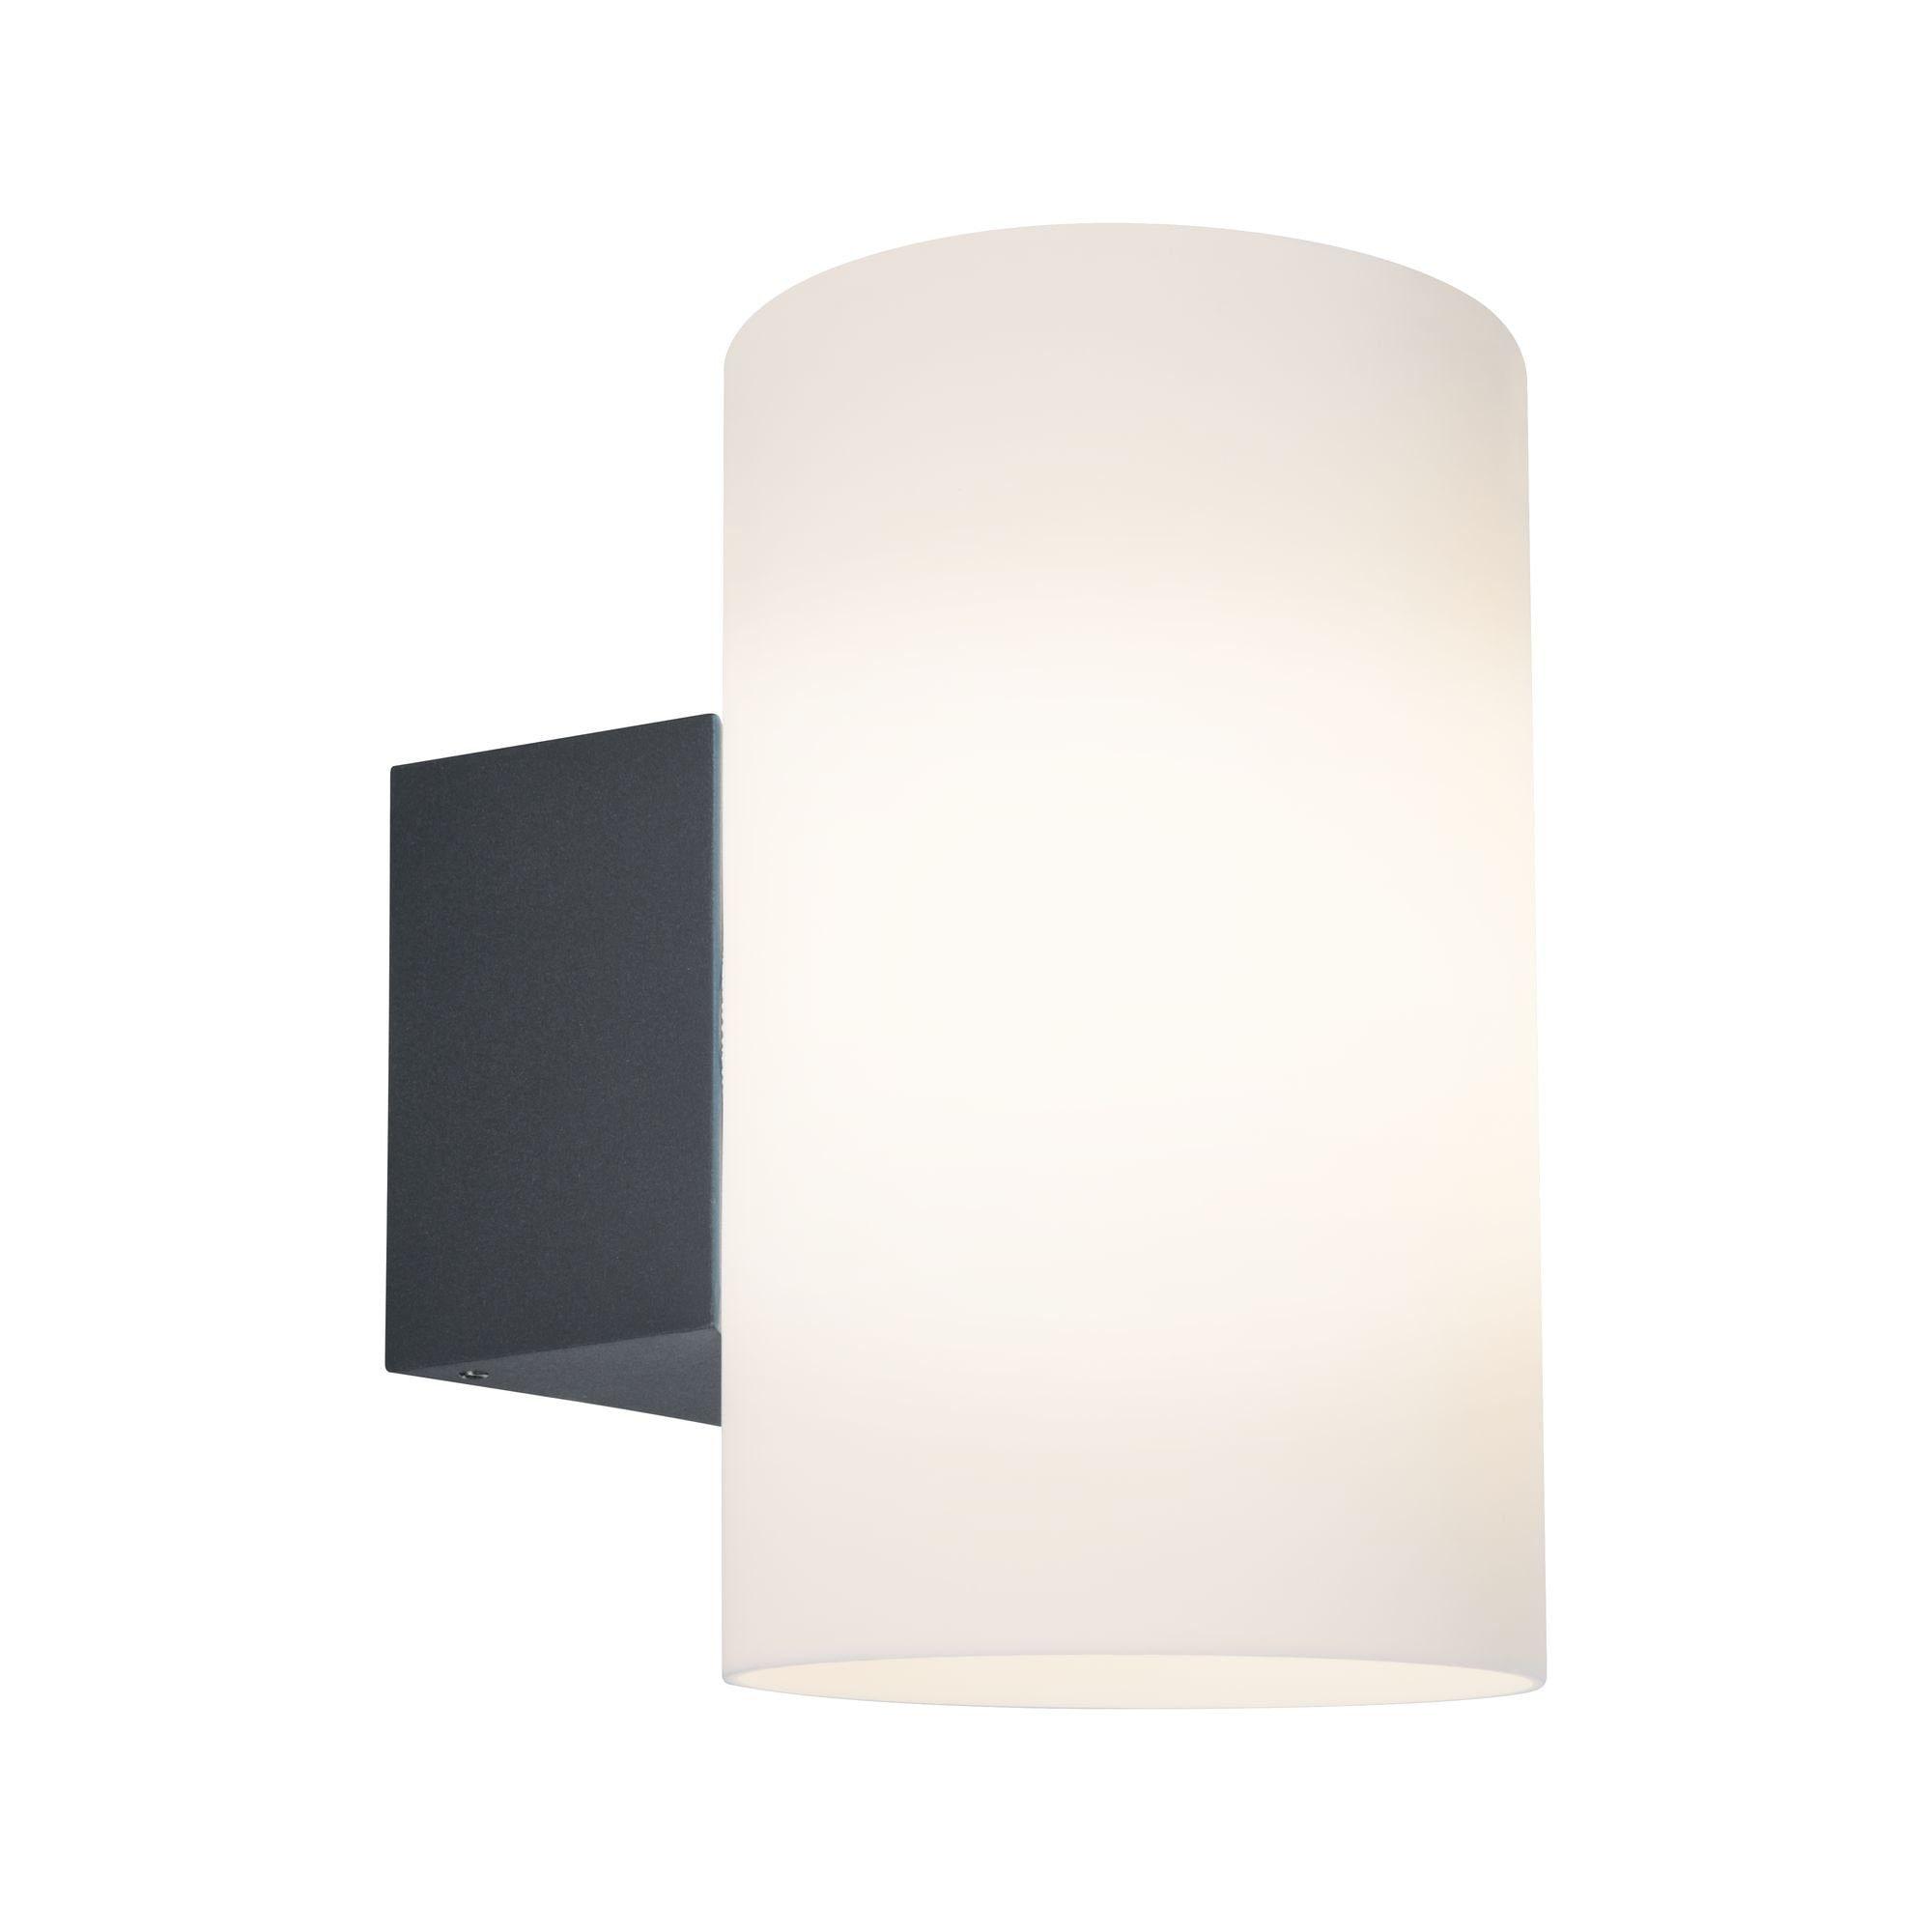 Paulmann,LED Außen-Wandleuchte Tube Anthrazit max. 15W E27